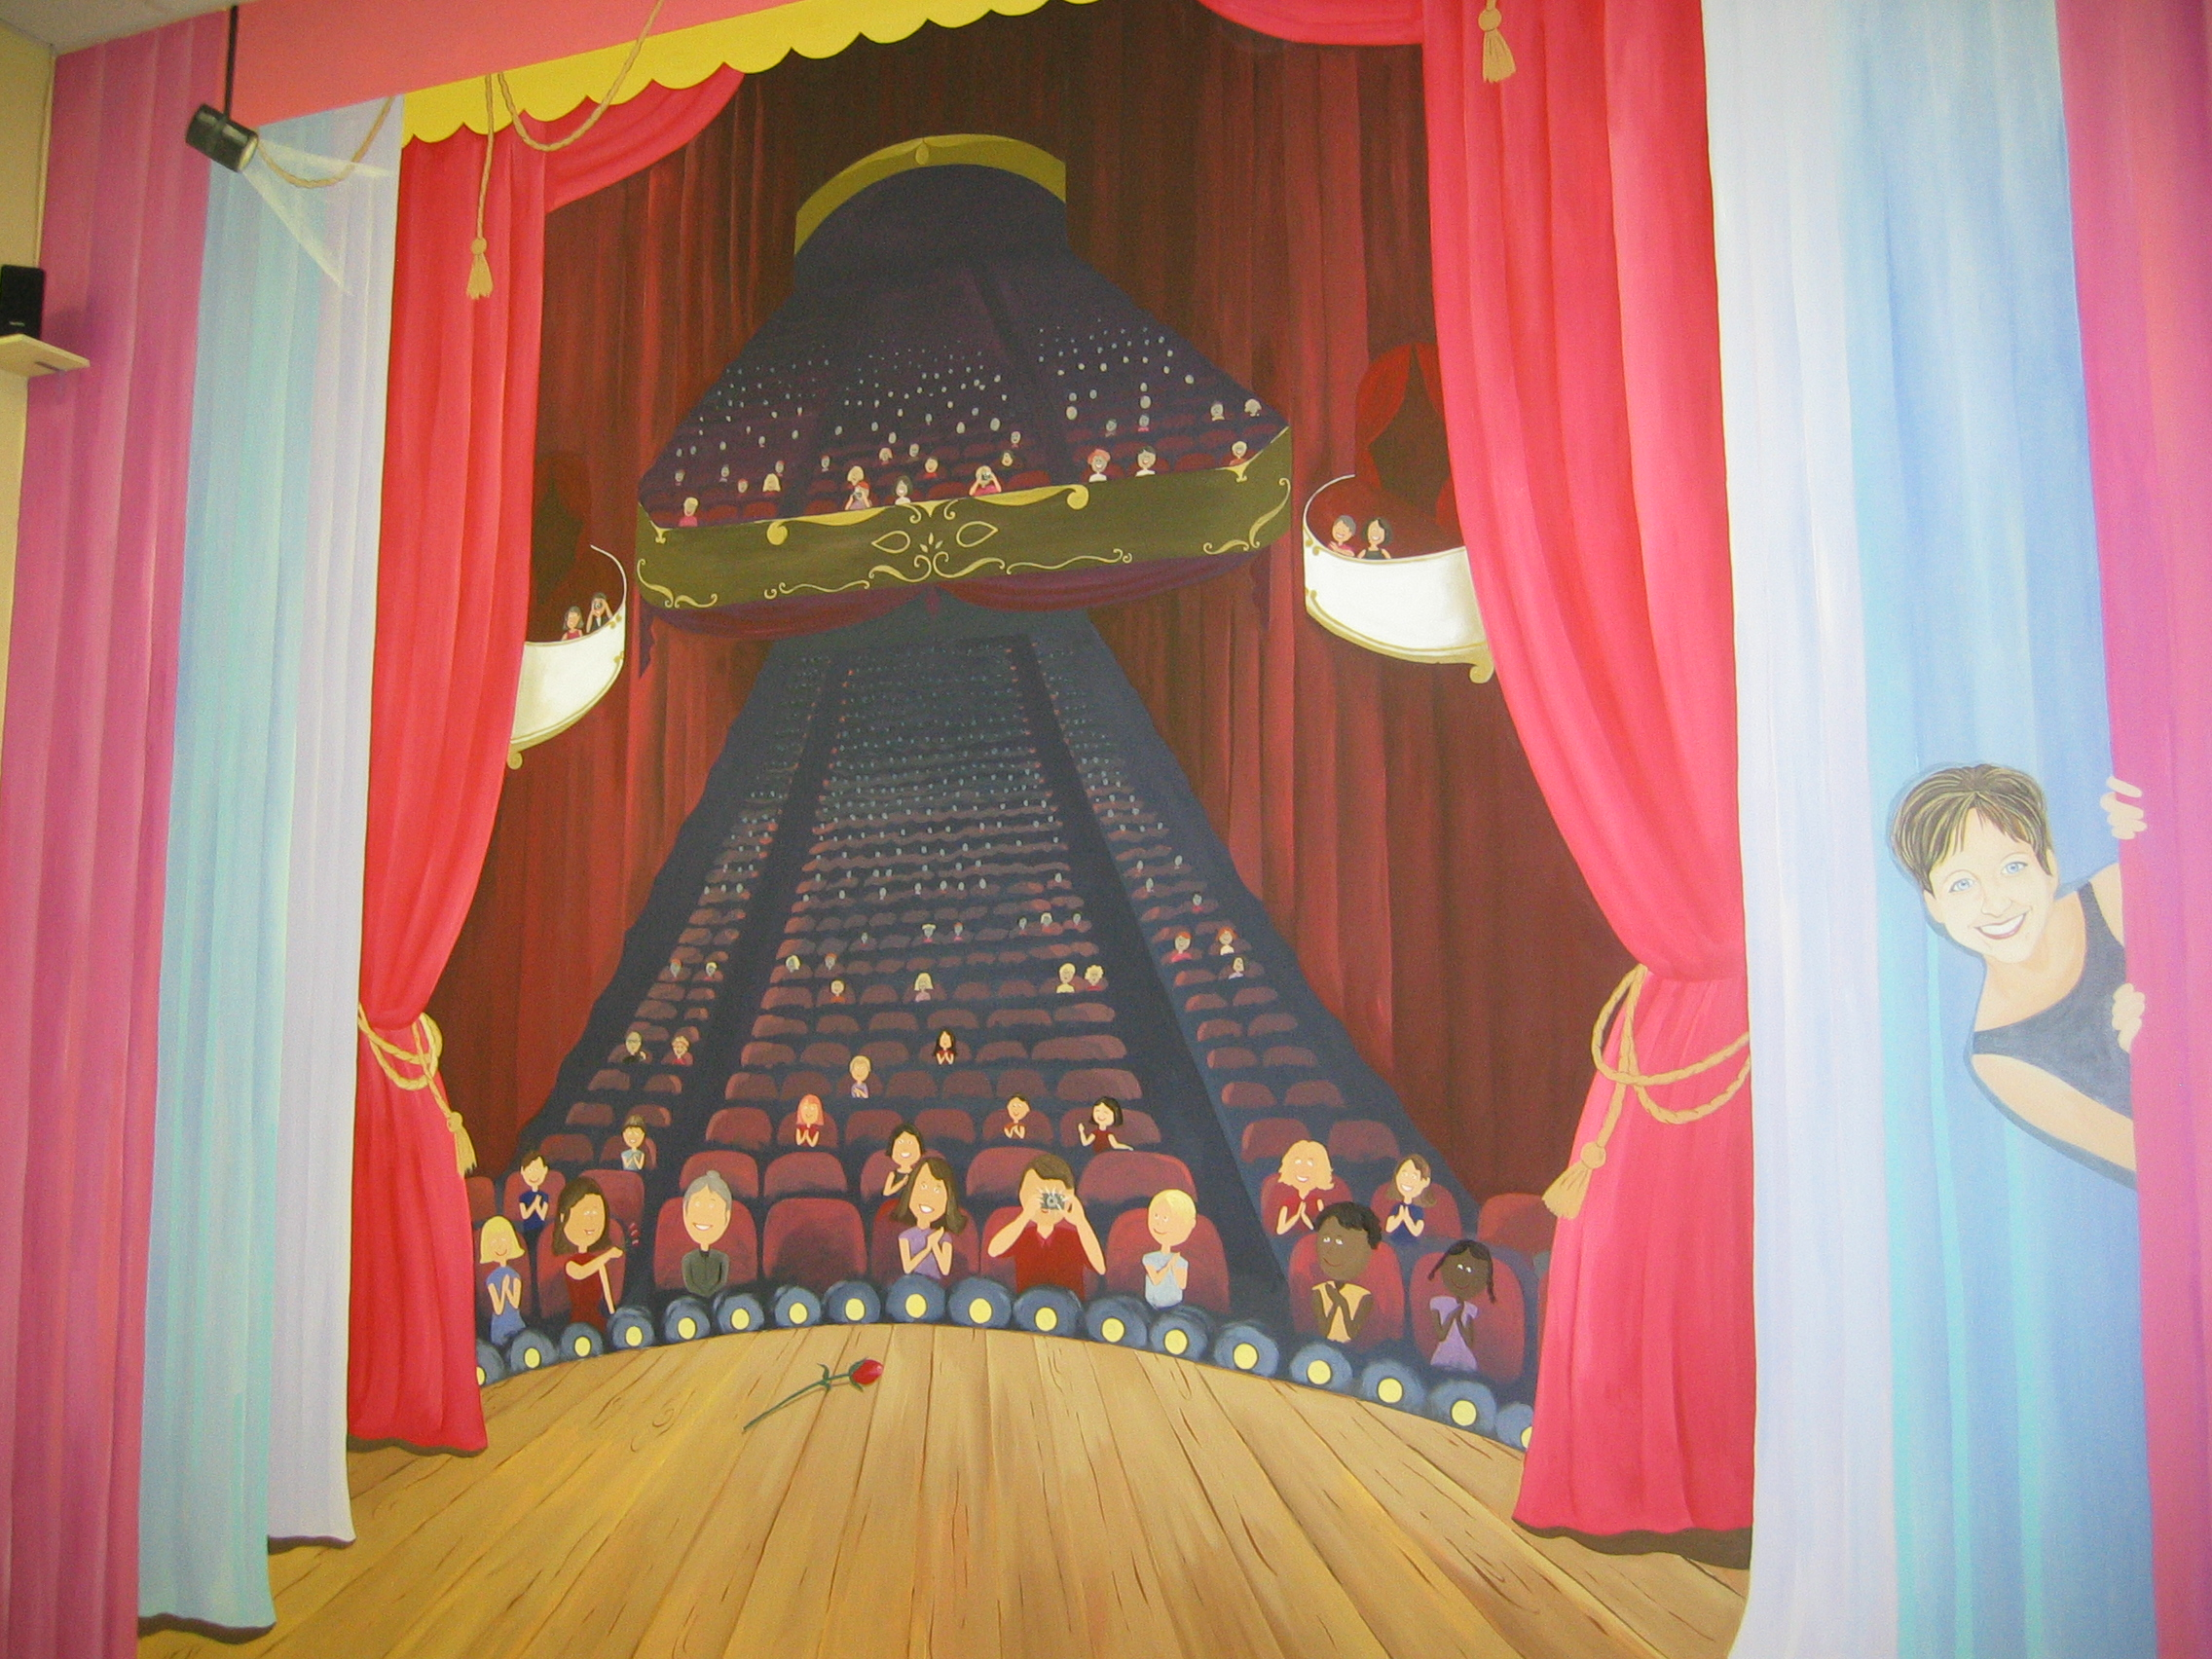 20031023.05.allen.mural.ballet.JPG